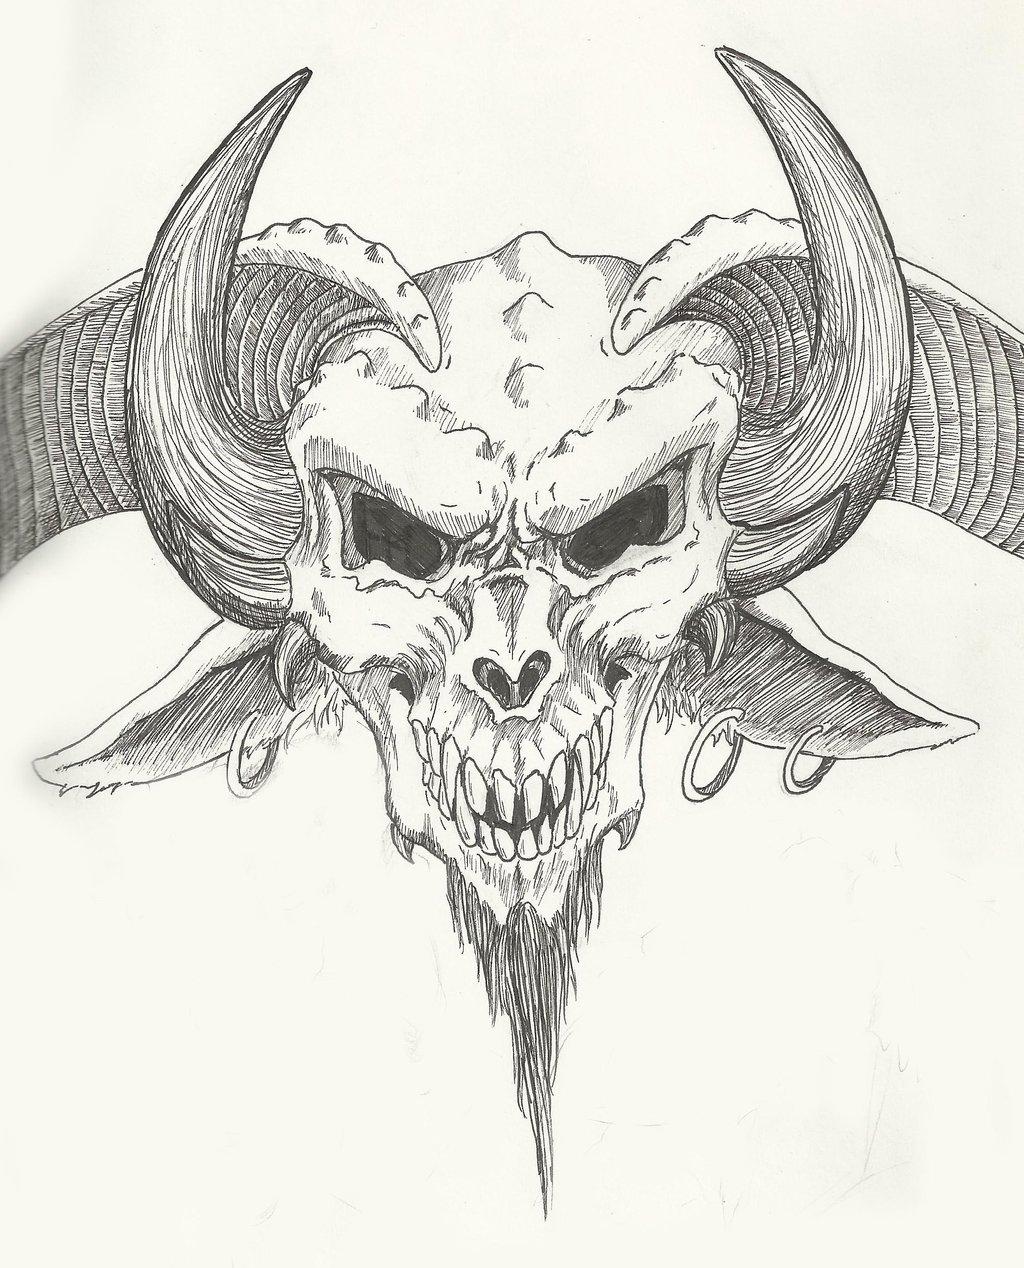 1024x1268 Drawing Of The Devil Drawing Of The Devil Devil's Headredsabbath